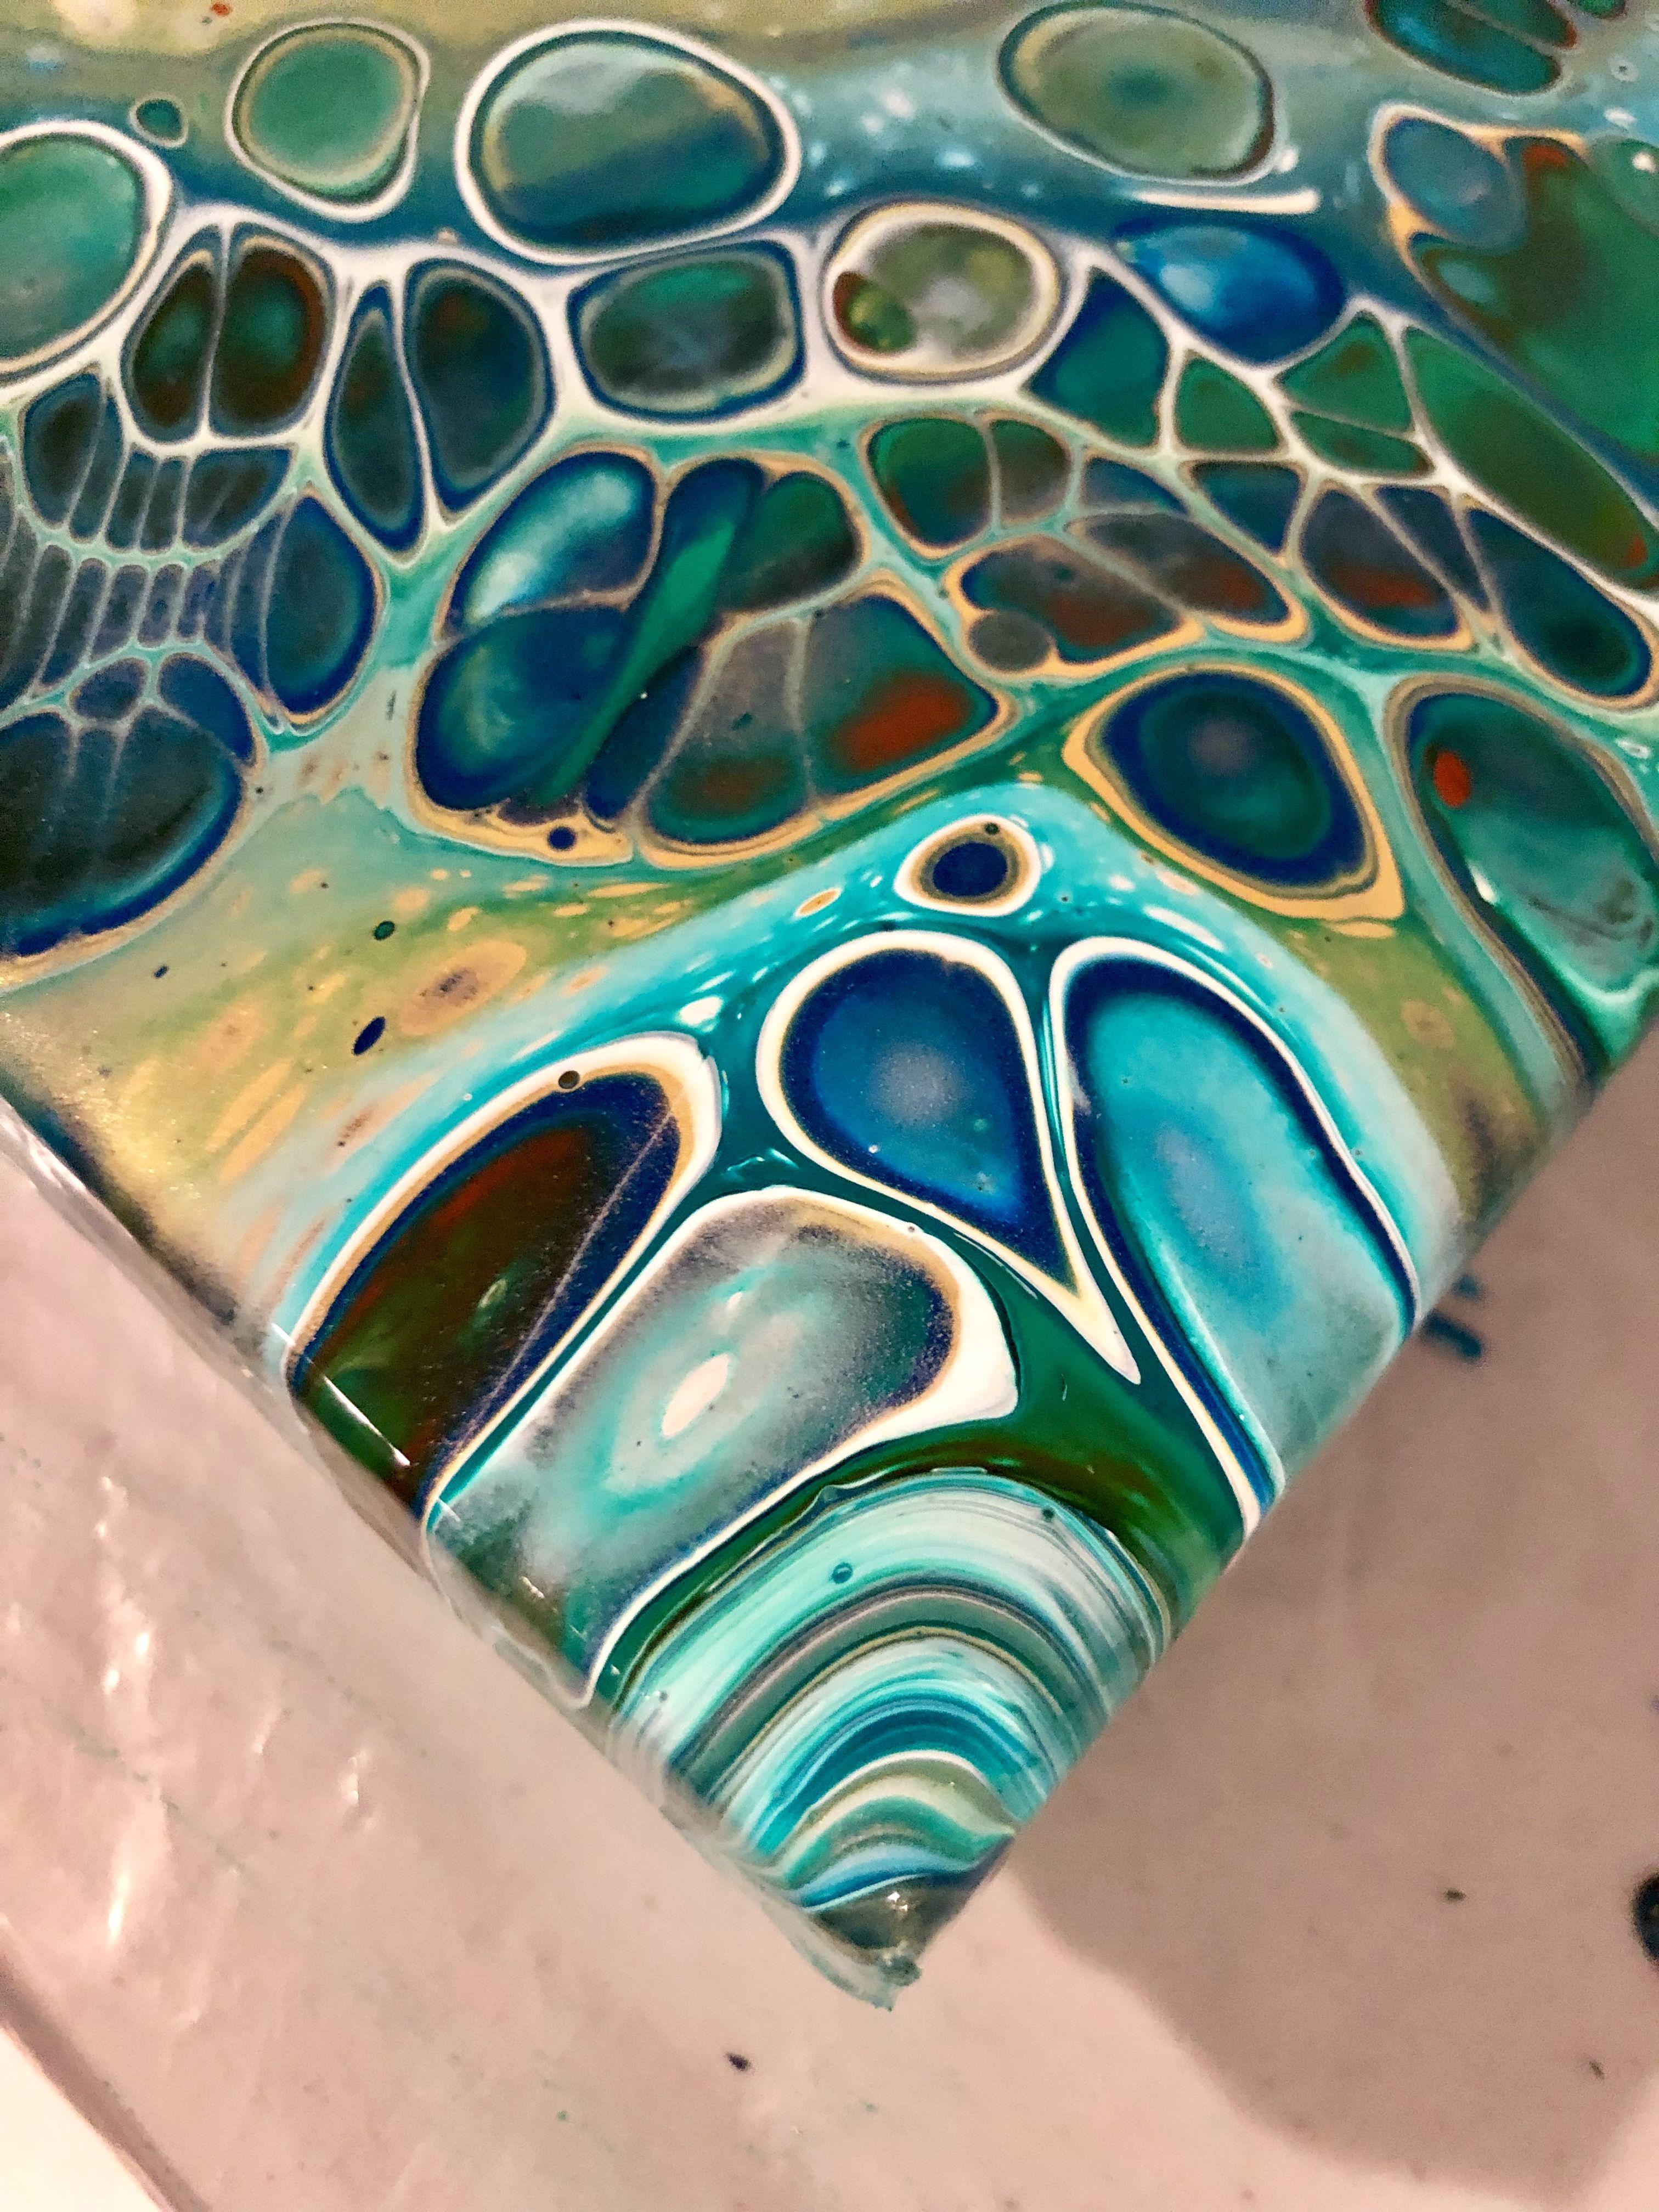 Teardrop Macro Shot Fluid Acrylic Painting By Waterfall Acrylics Acrylic Pouring Art Acrylic Art Fluid Acrylic Painting